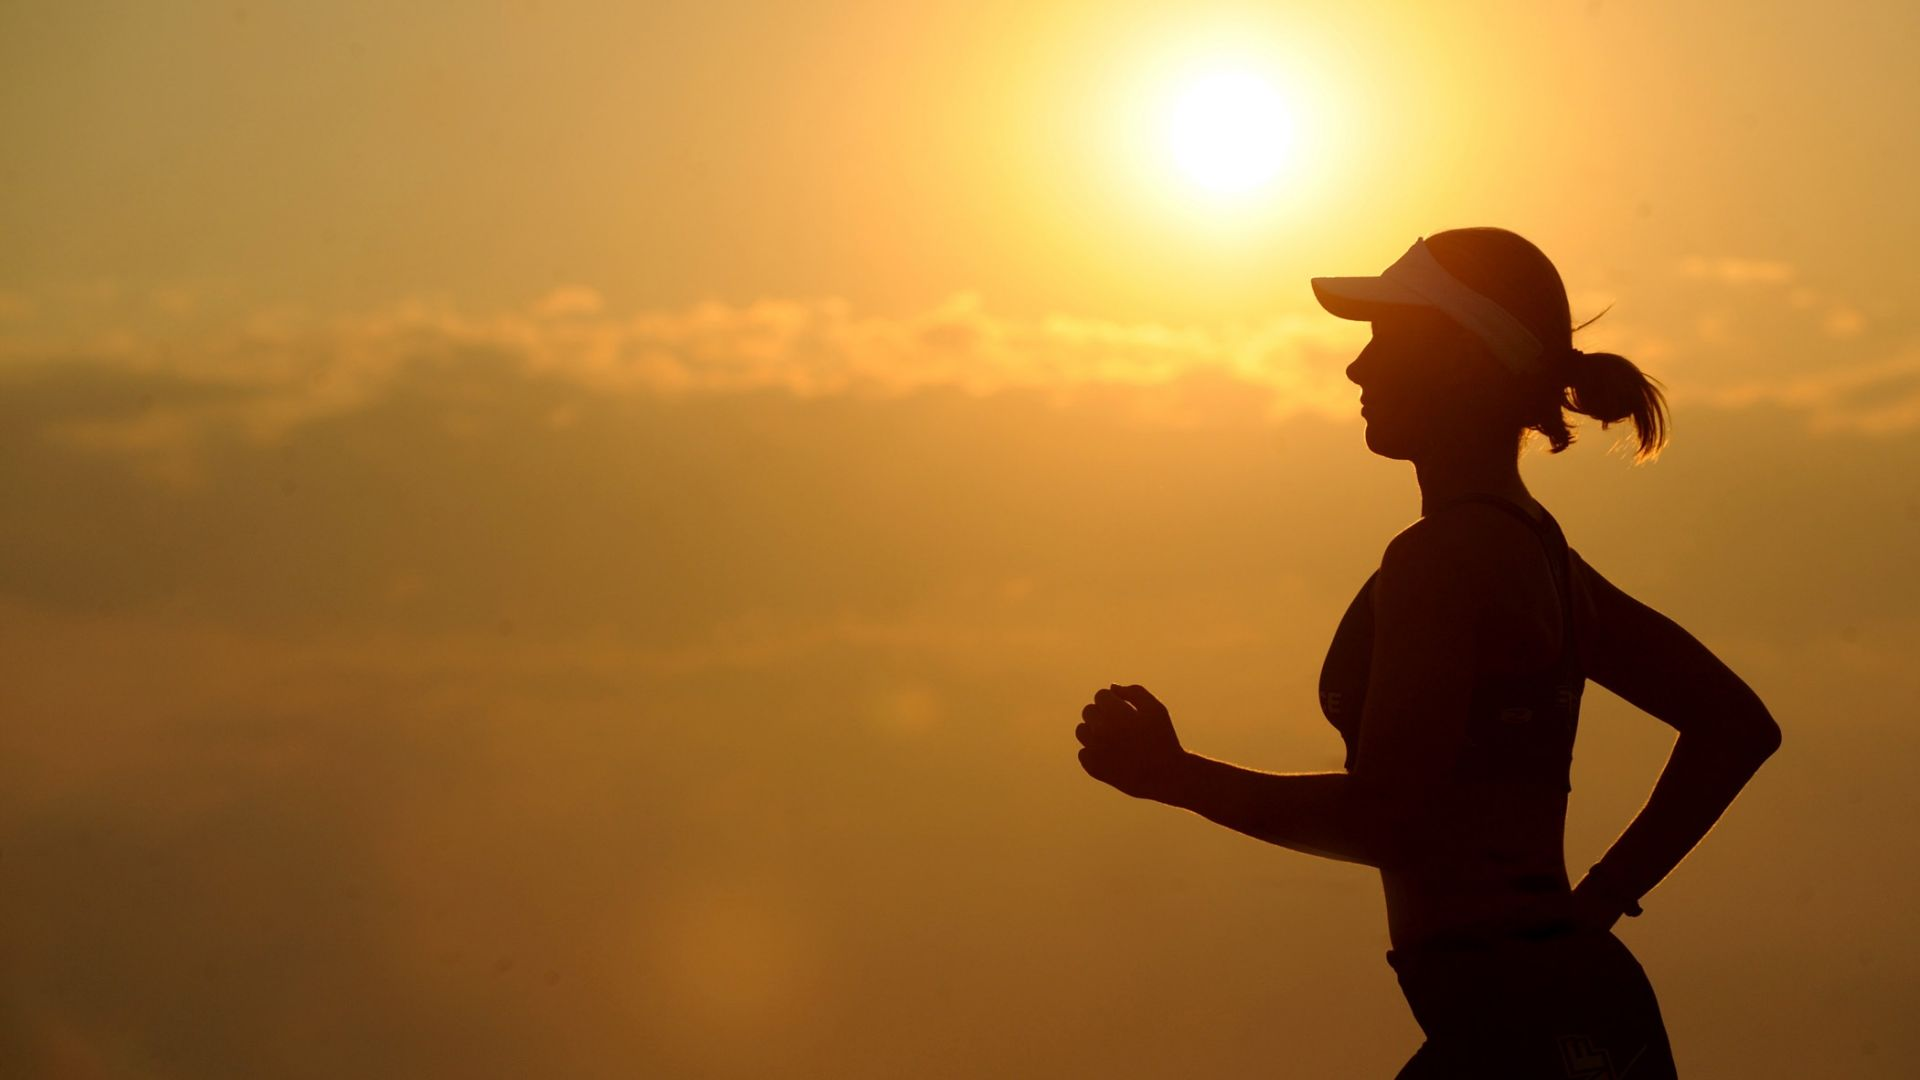 Wallpaper Girl Training Weight Loss Sports Figure